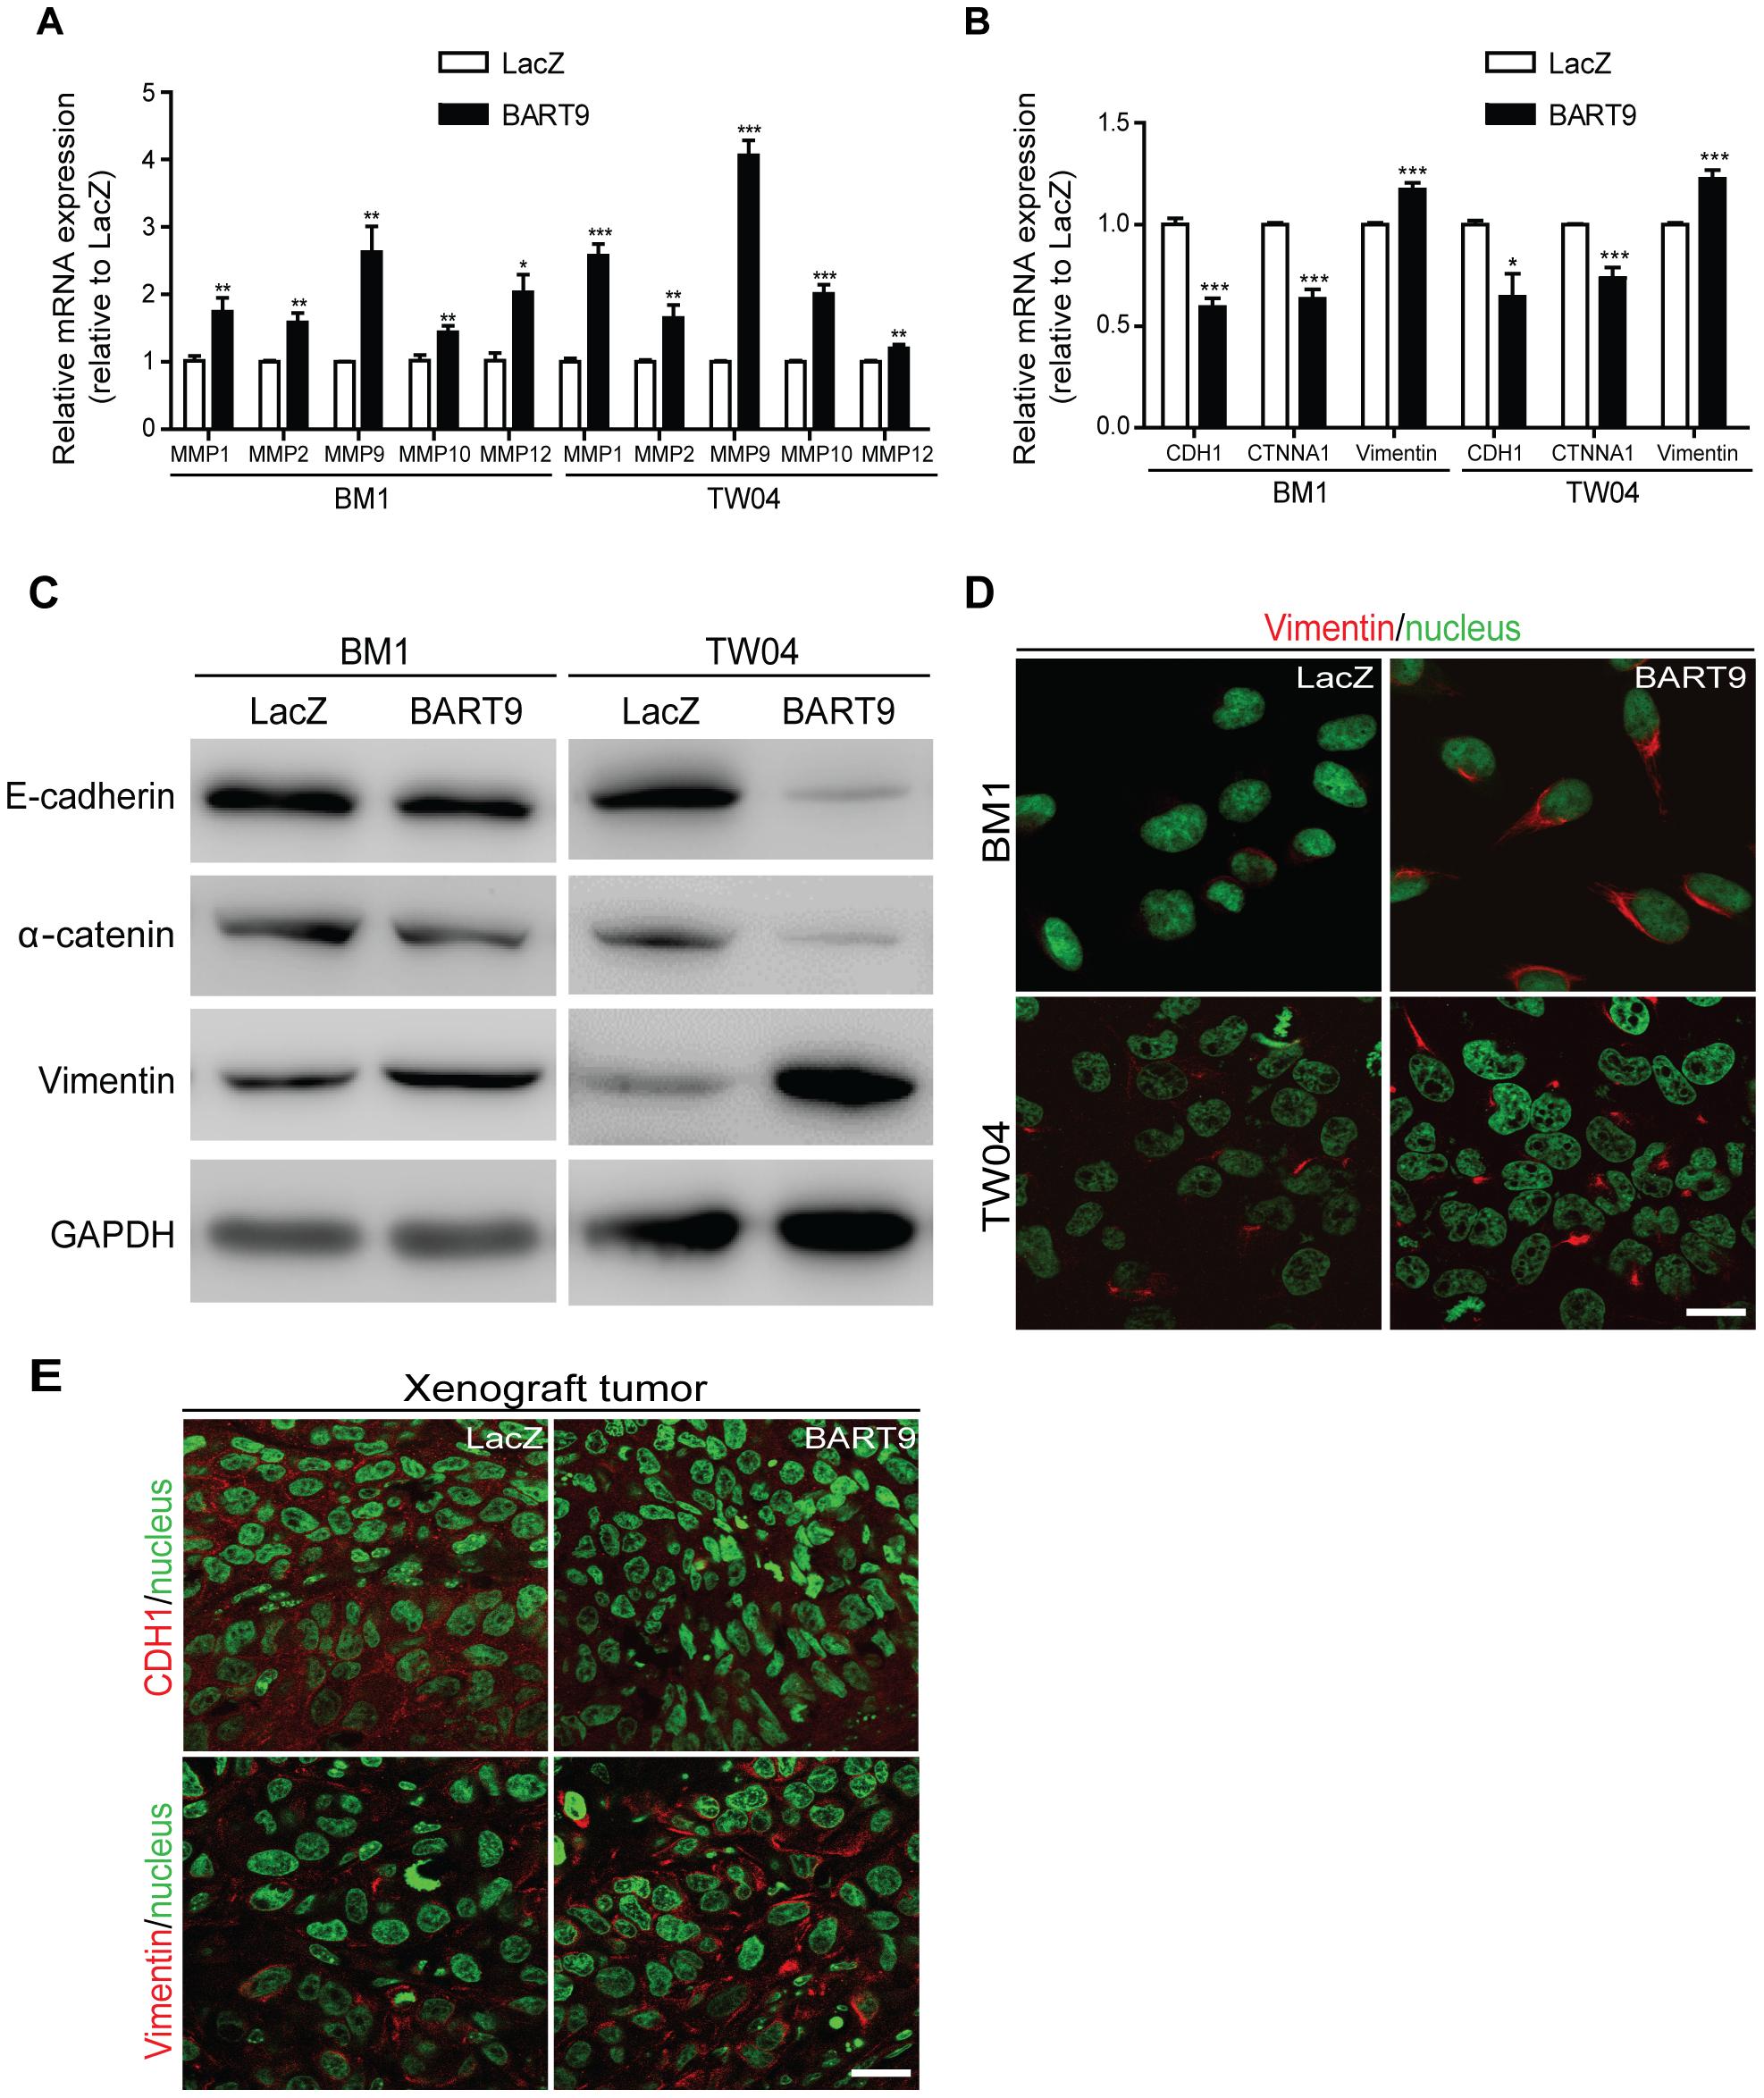 miR-BART9 up-regulates mesenchymal markers in EBV-negative NPC cells.